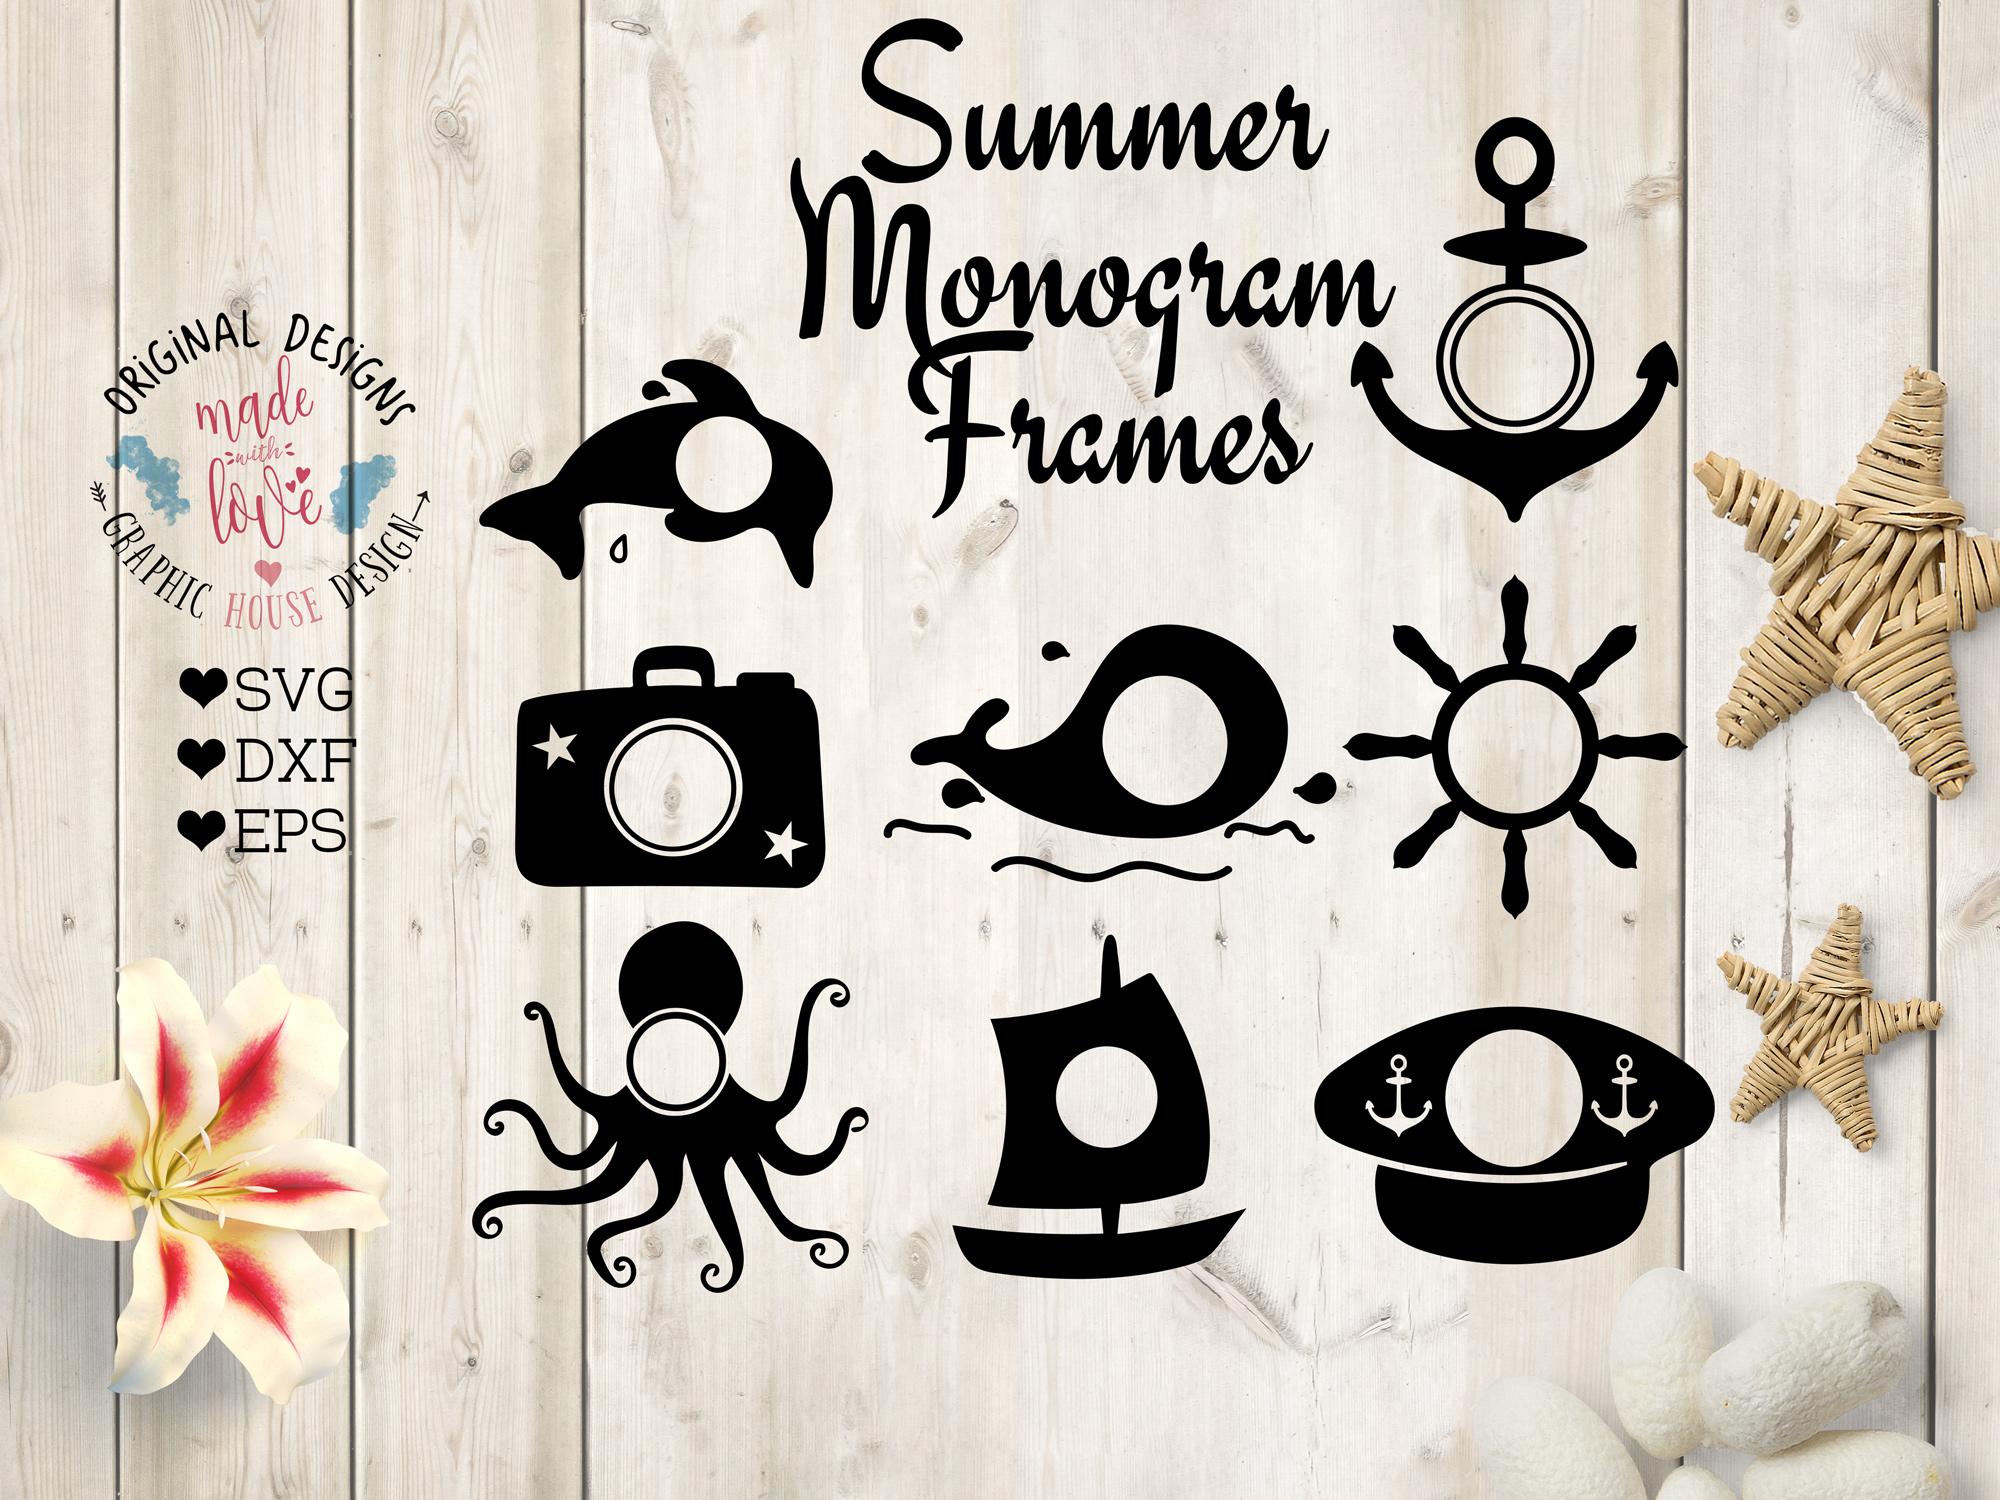 Summer Monogram Frames Cut Files SVG, DXF, EPS example image 1